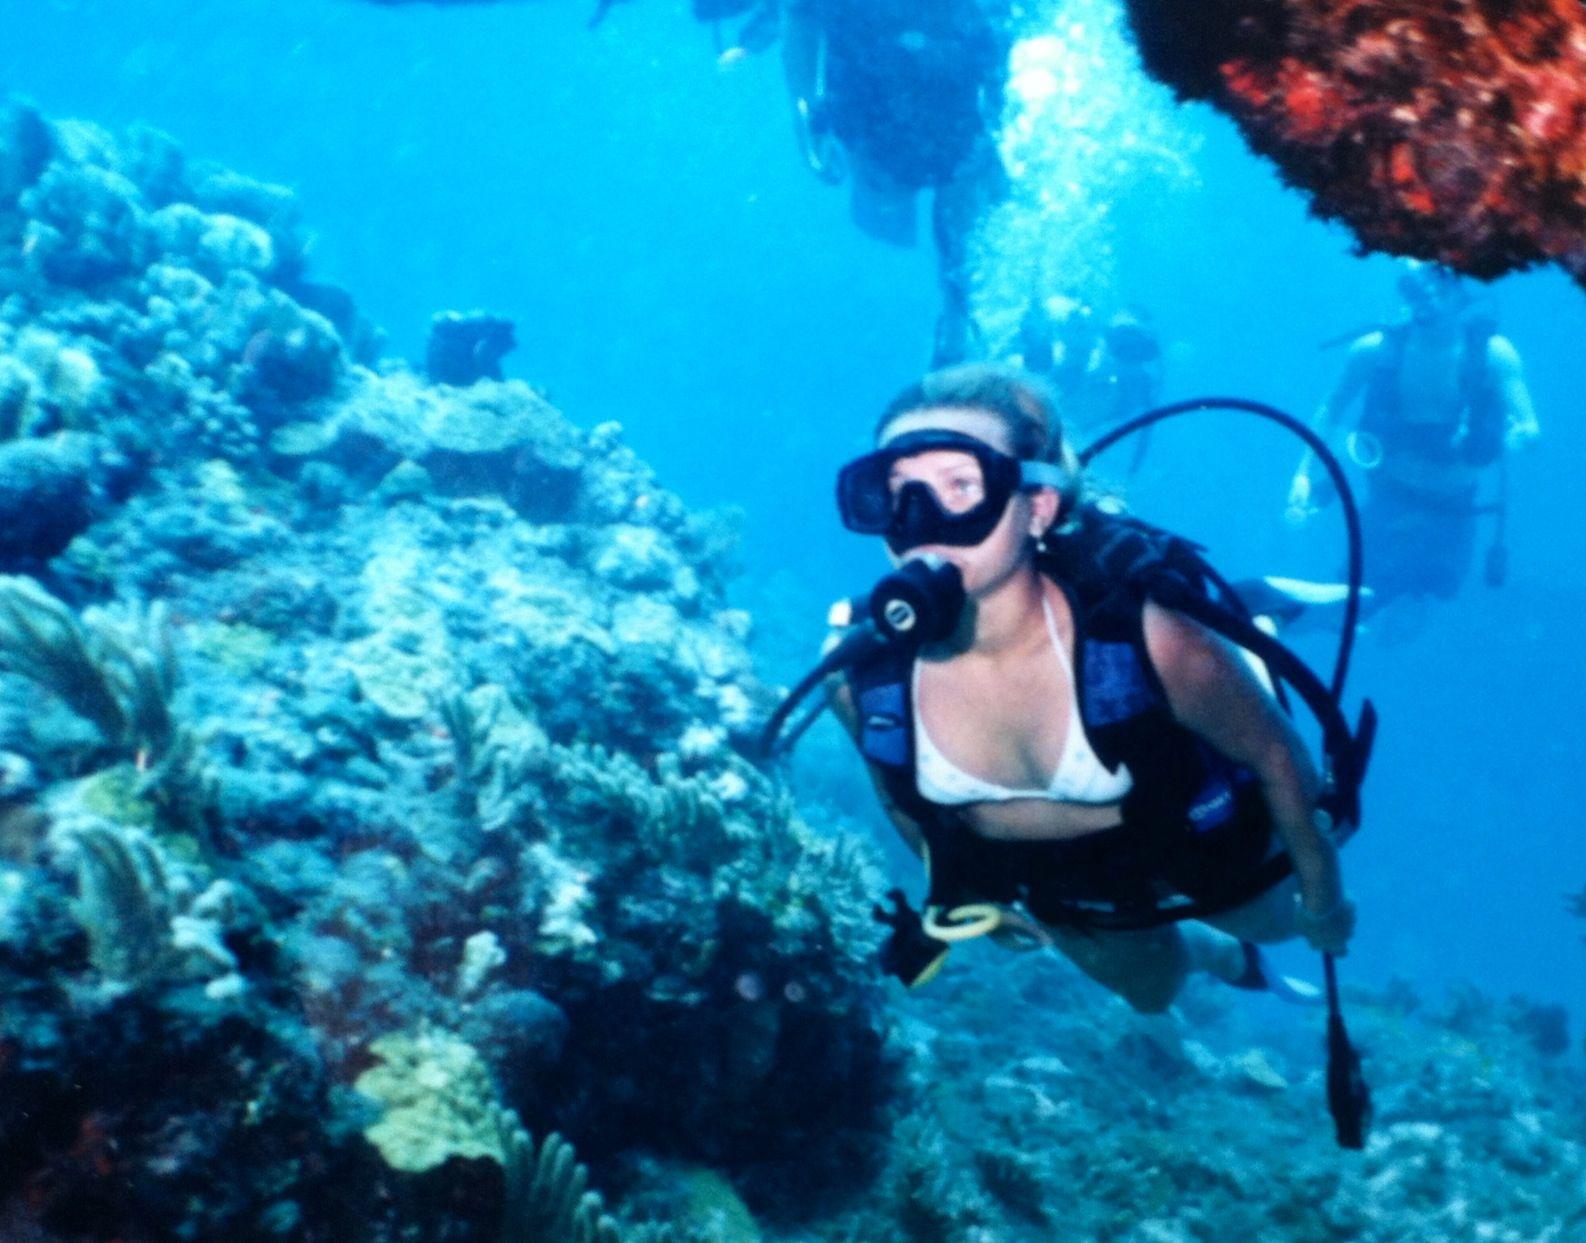 Scuba Diving In Jamaica. Getting Certified In 3 Weeks